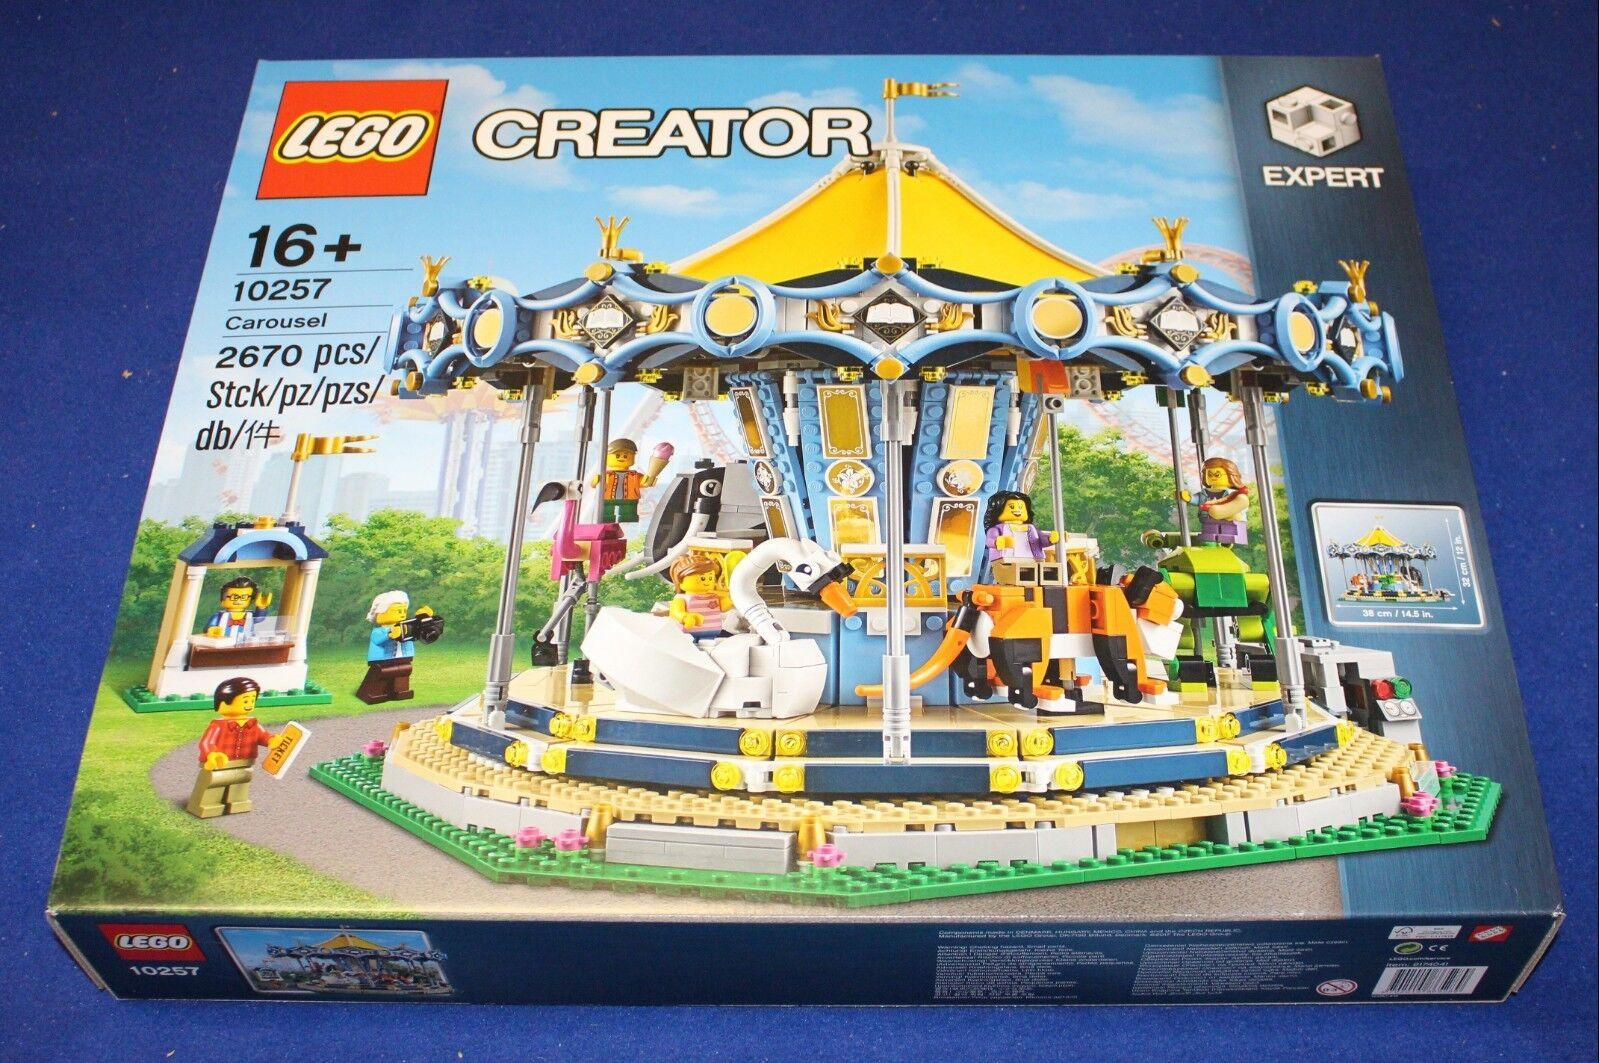 presa di fabbrica Lego Lego Lego Creator 10257 Karussell (autoousel) NEU, OVP & MISB  presa